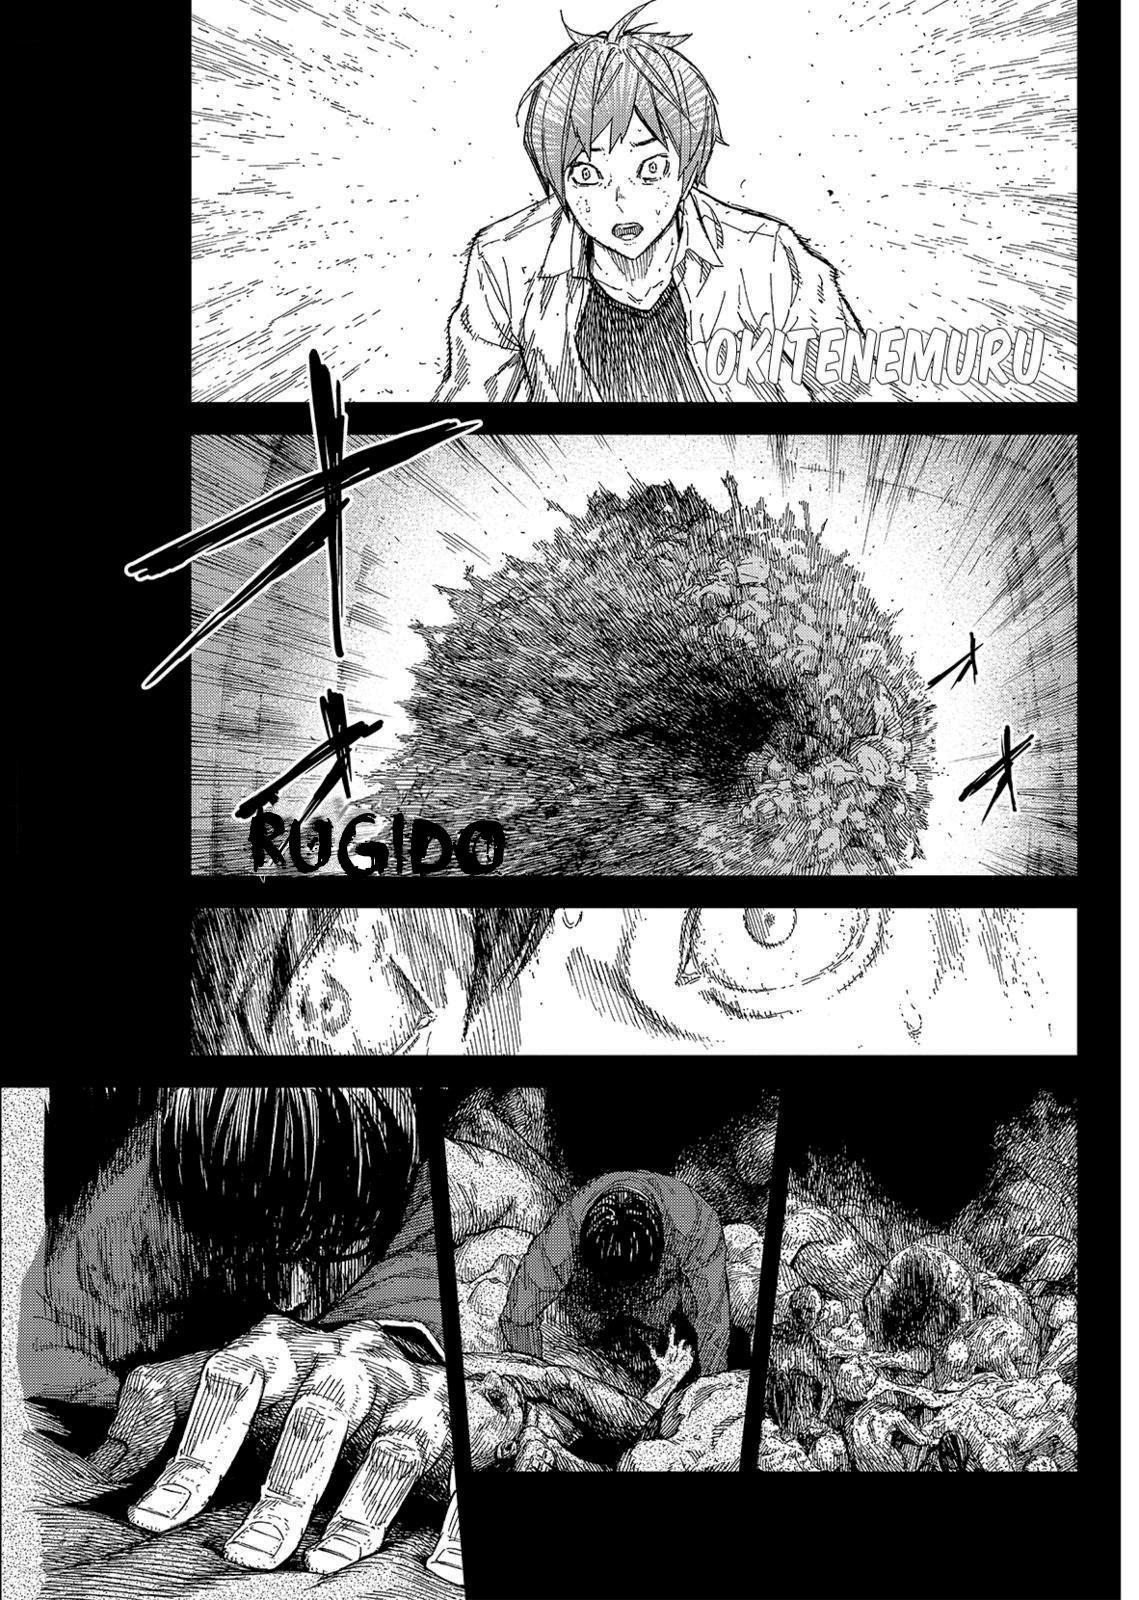 http://c5.ninemanga.com/es_manga/54/16310/449597/a29a5ba2cb7bdeabba22de8c83321b46.jpg Page 2